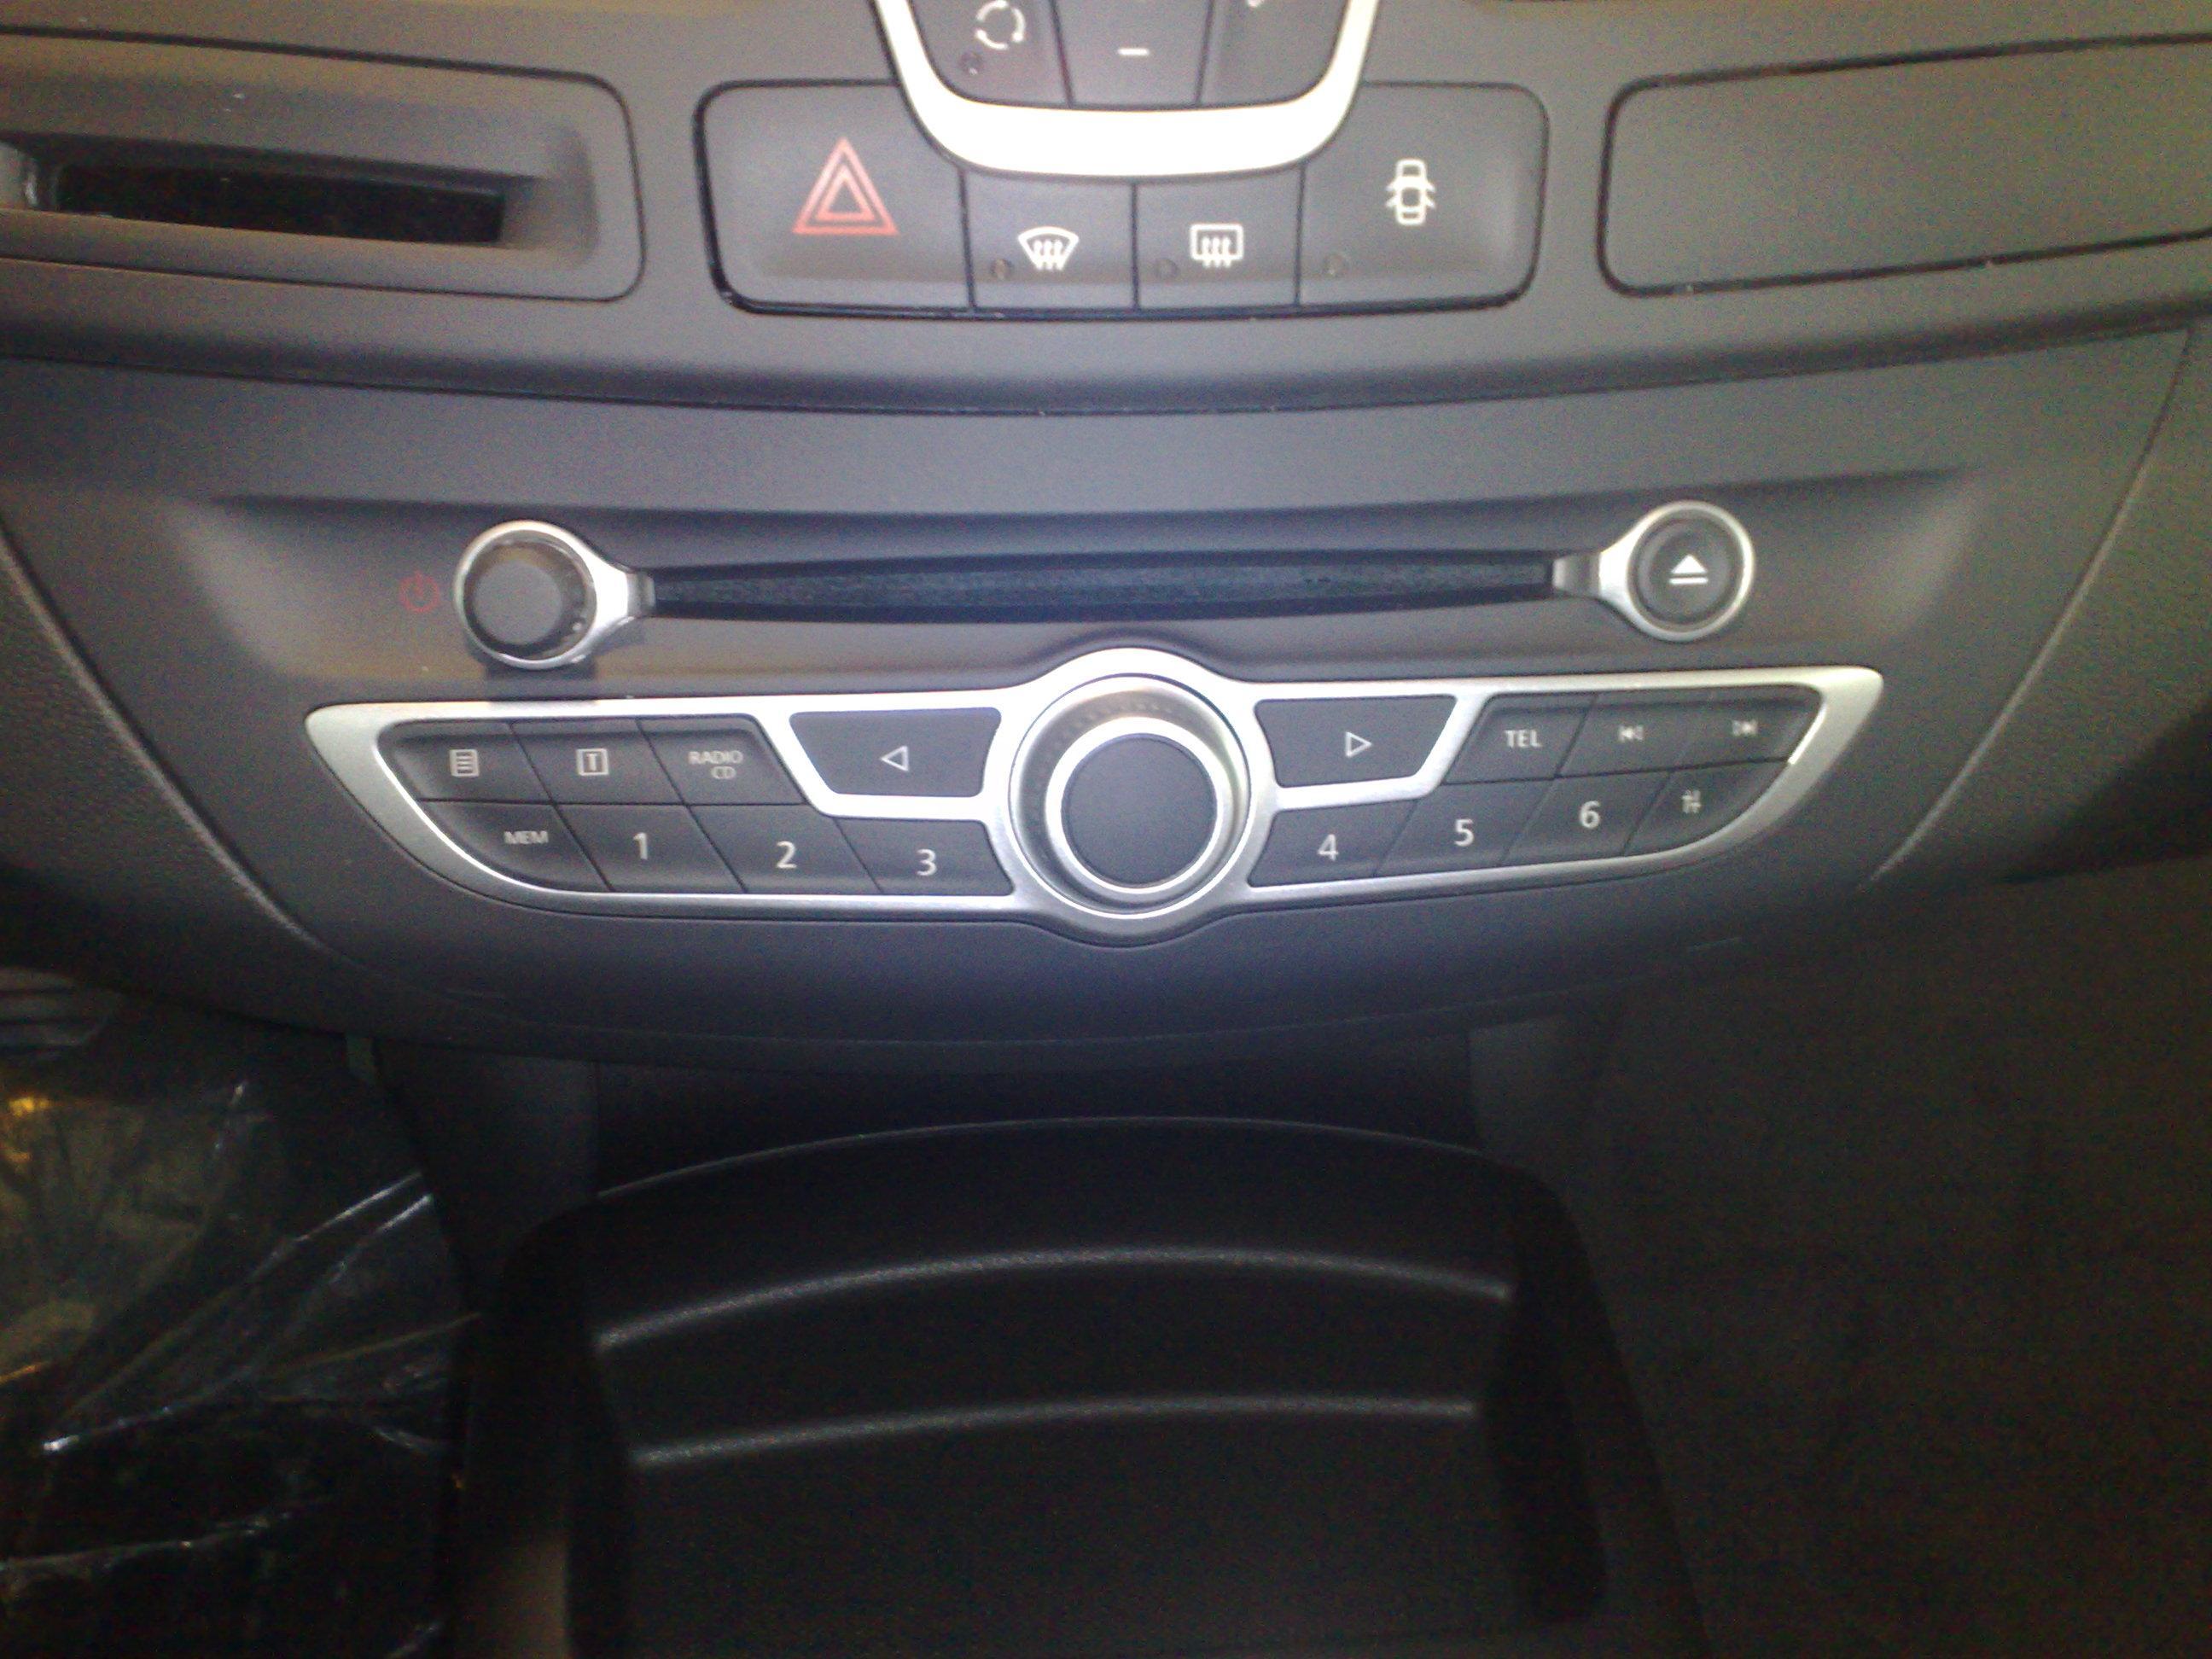 [Frederic69] Laguna III.2 Estate GT 4Control 130 Big-autoradio